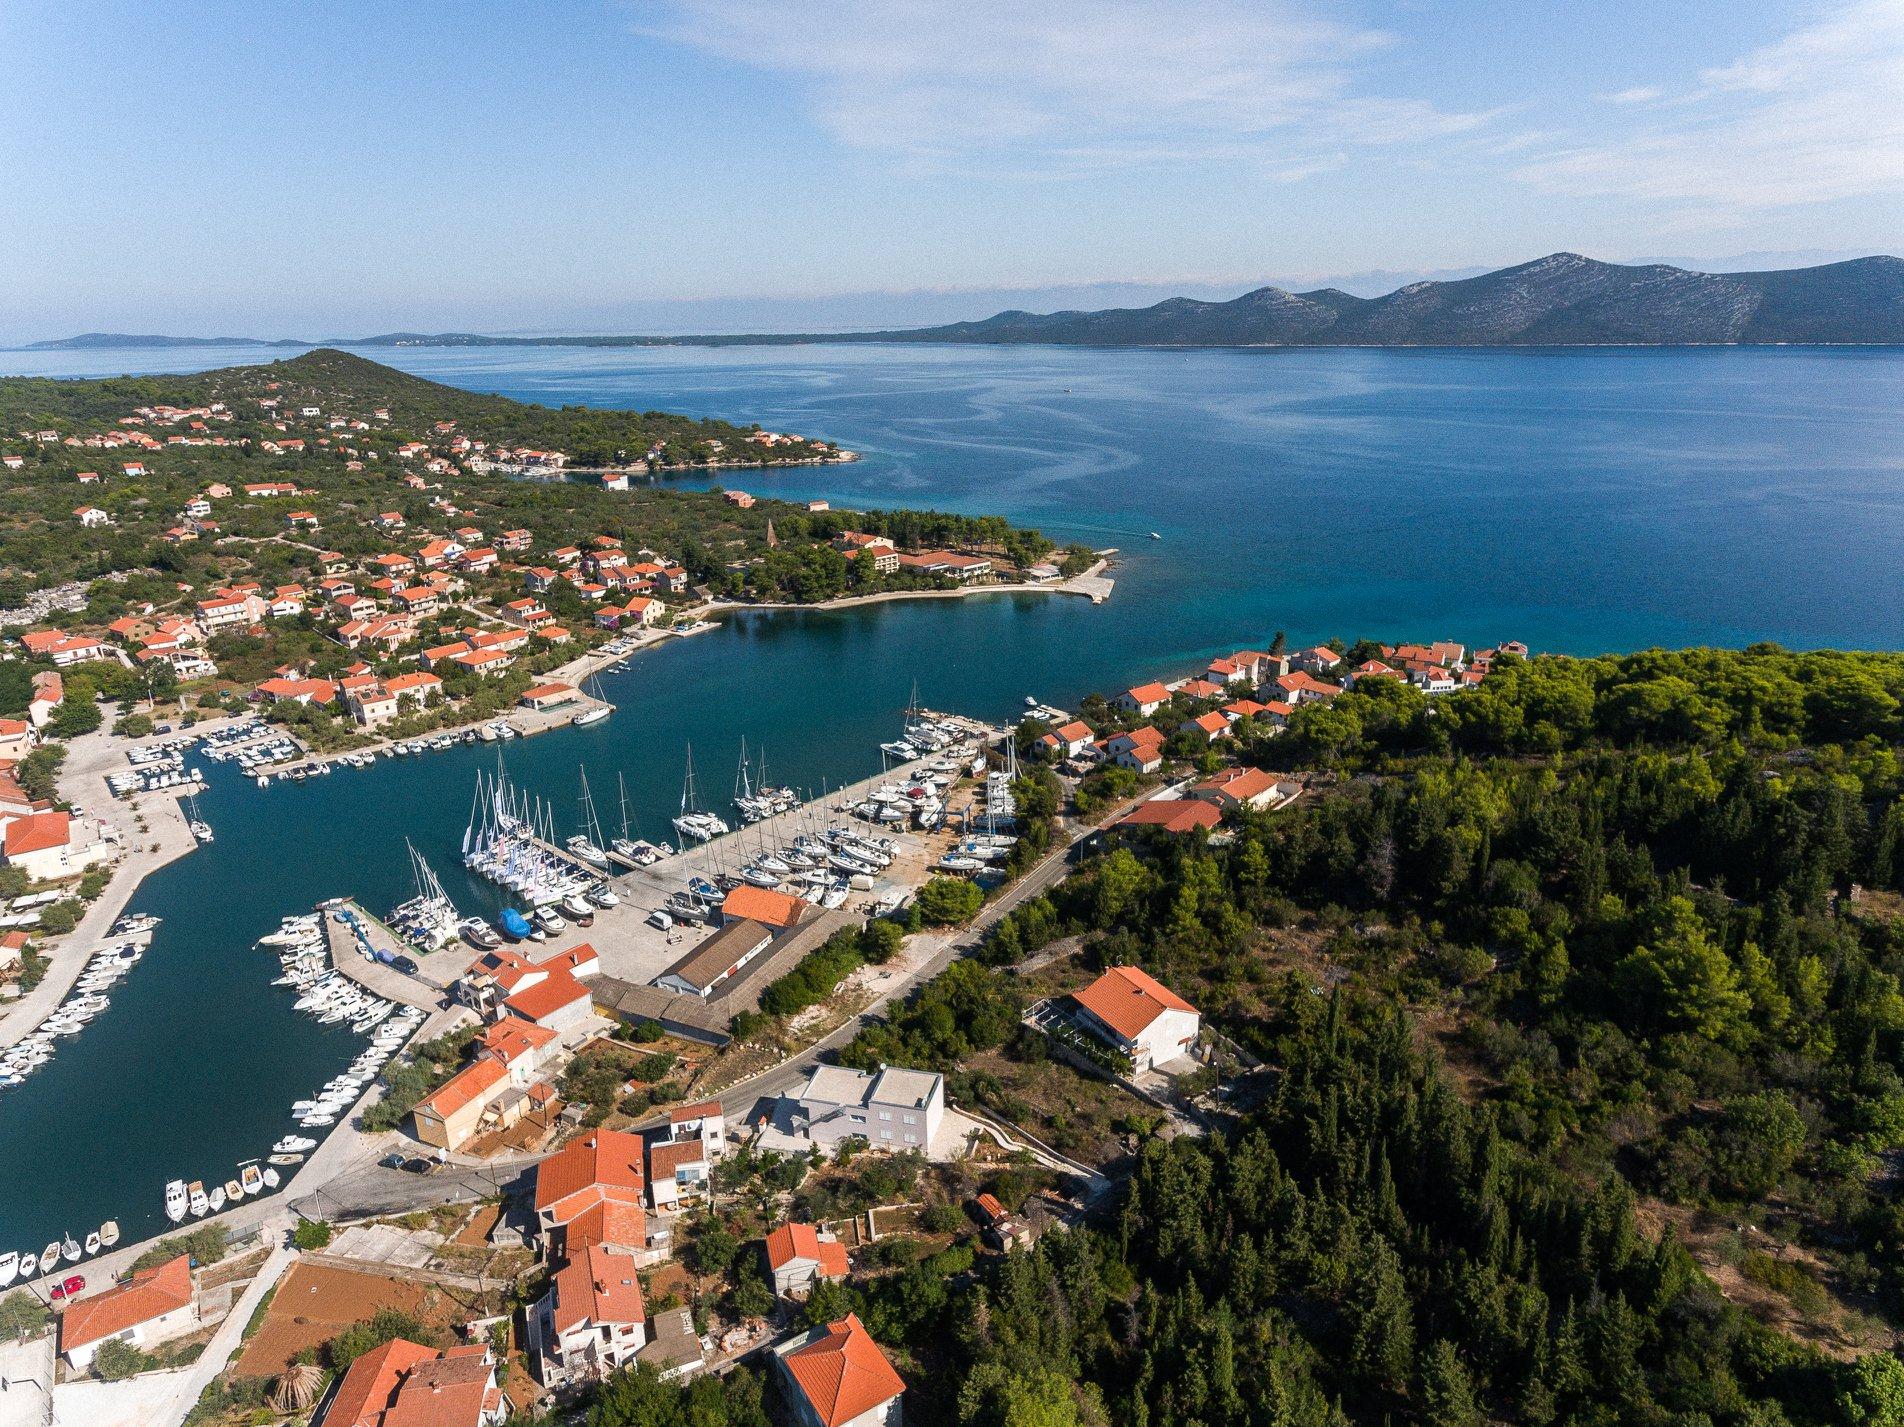 Море, яхты, порт - ДСМ групп Фармрегата 2019 - DSM Group Pharmregata 2019